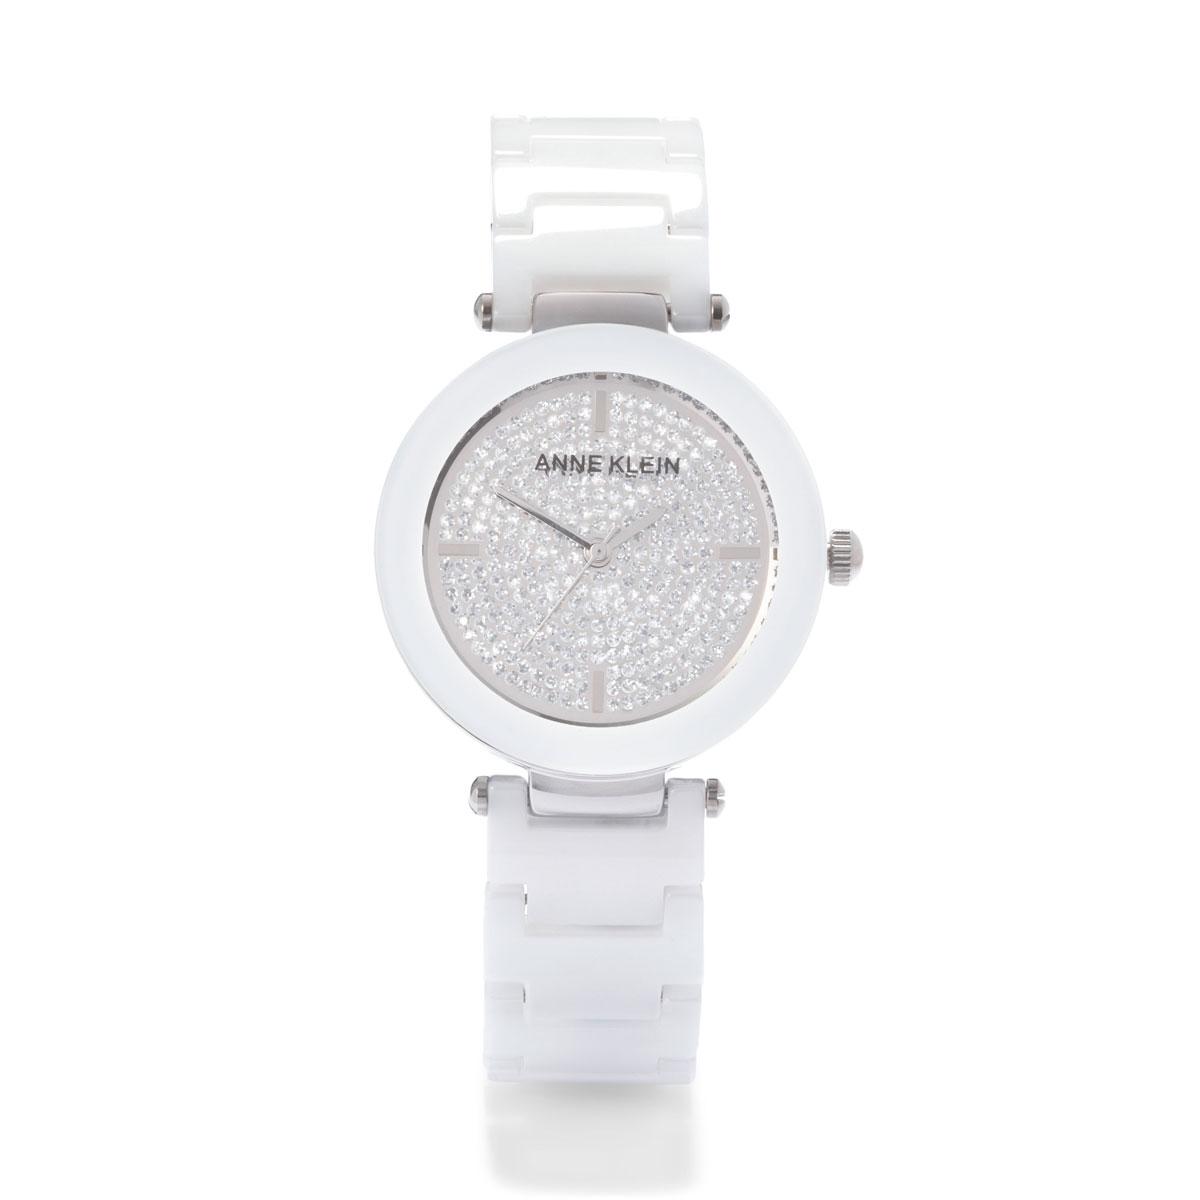 "Часы наручные женские Anne Klein ""Ceramics"", цвет: белый, стальной. 1019PVWT"